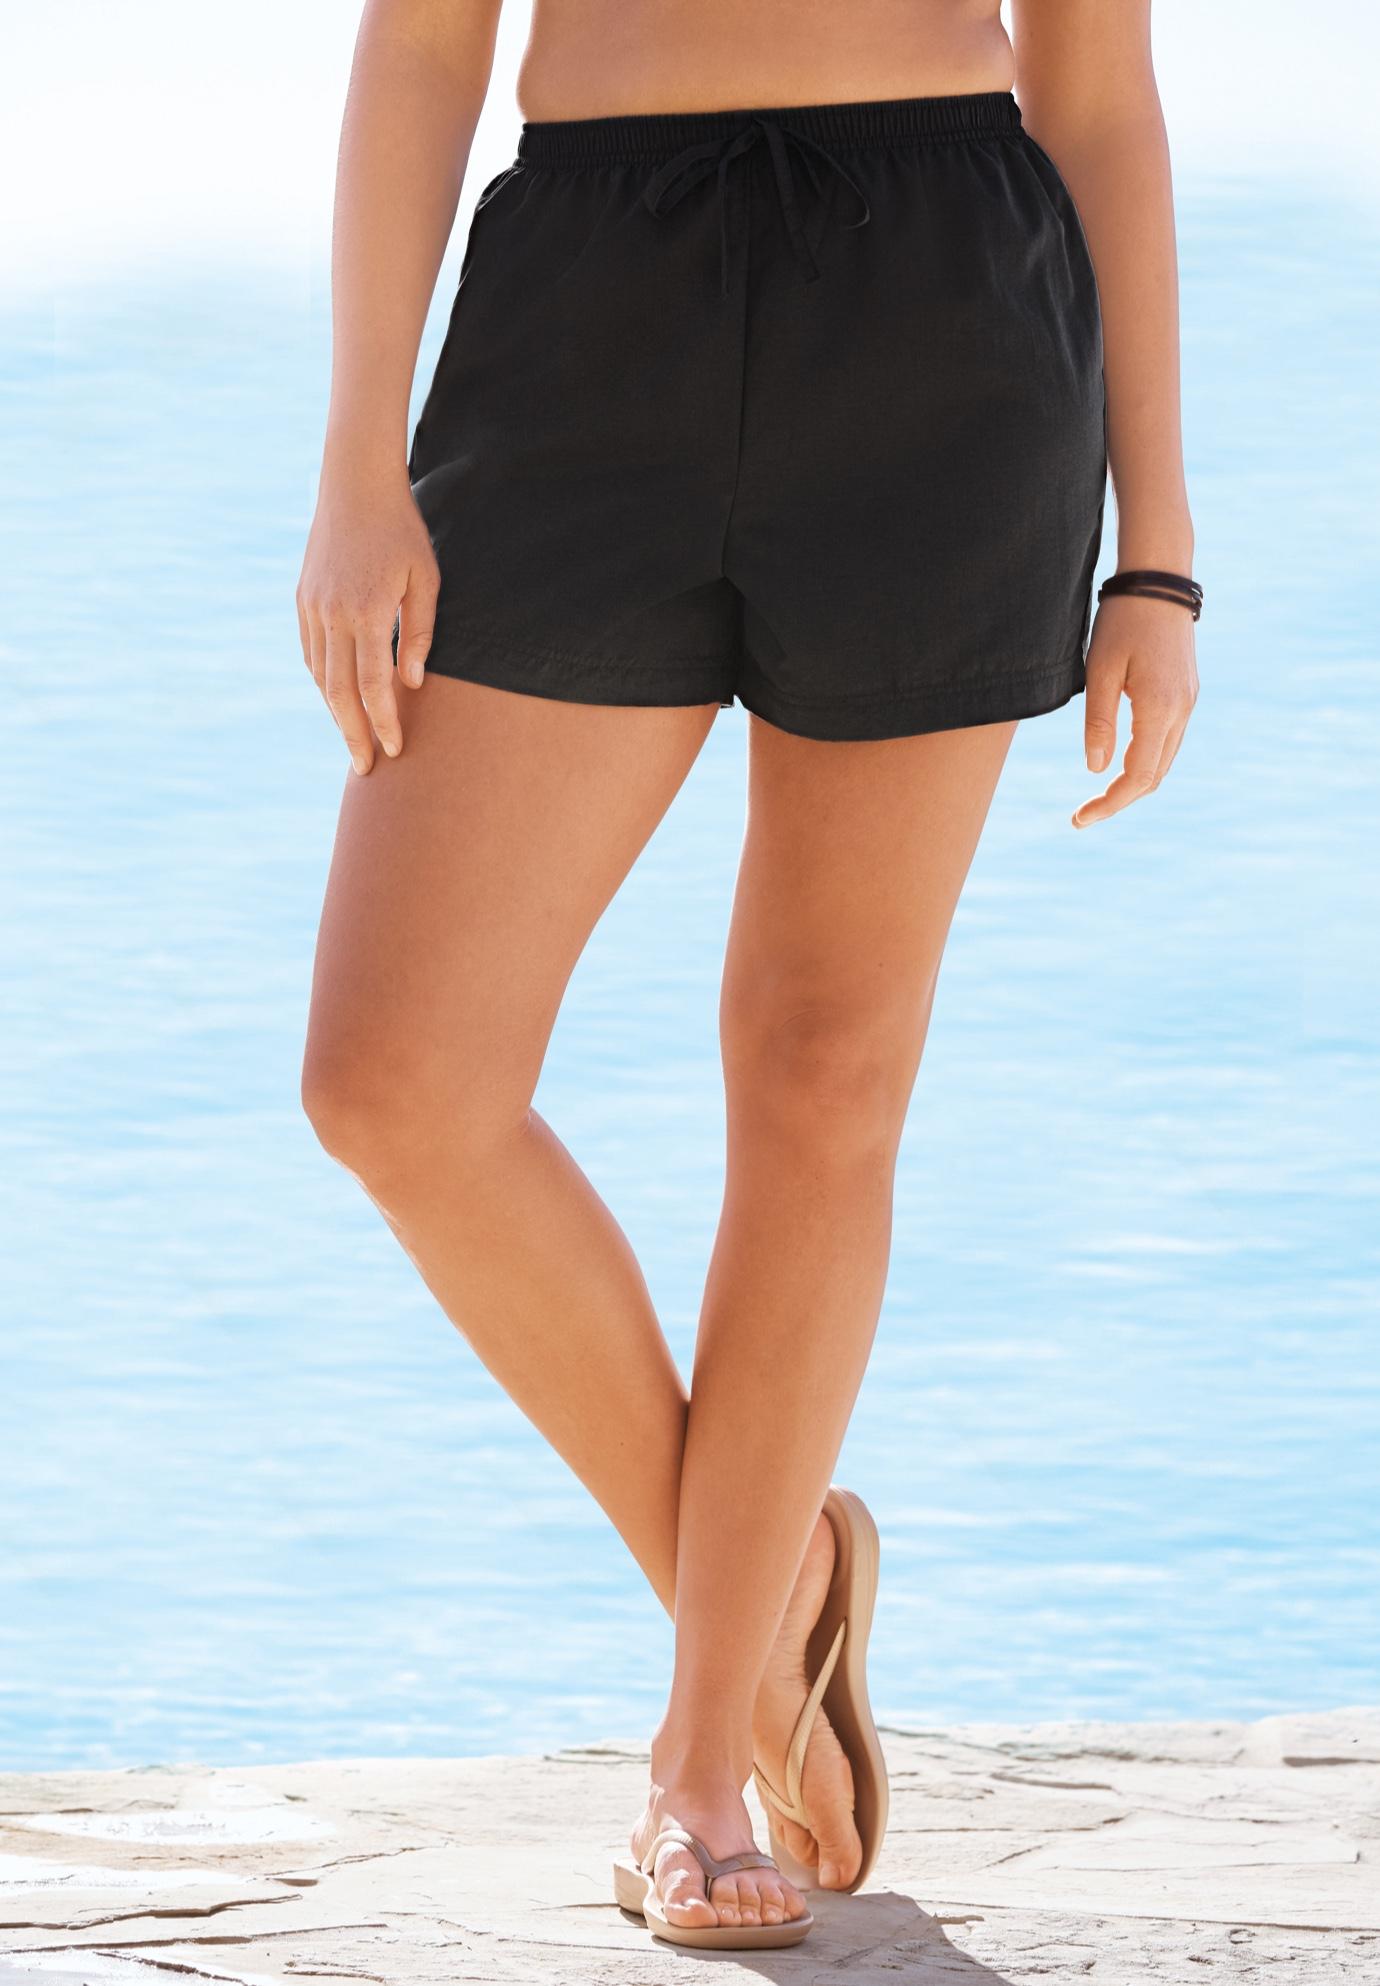 120141f641 Taslon® Swim Shorts| Plus Size Swim Bottoms | Jessica London